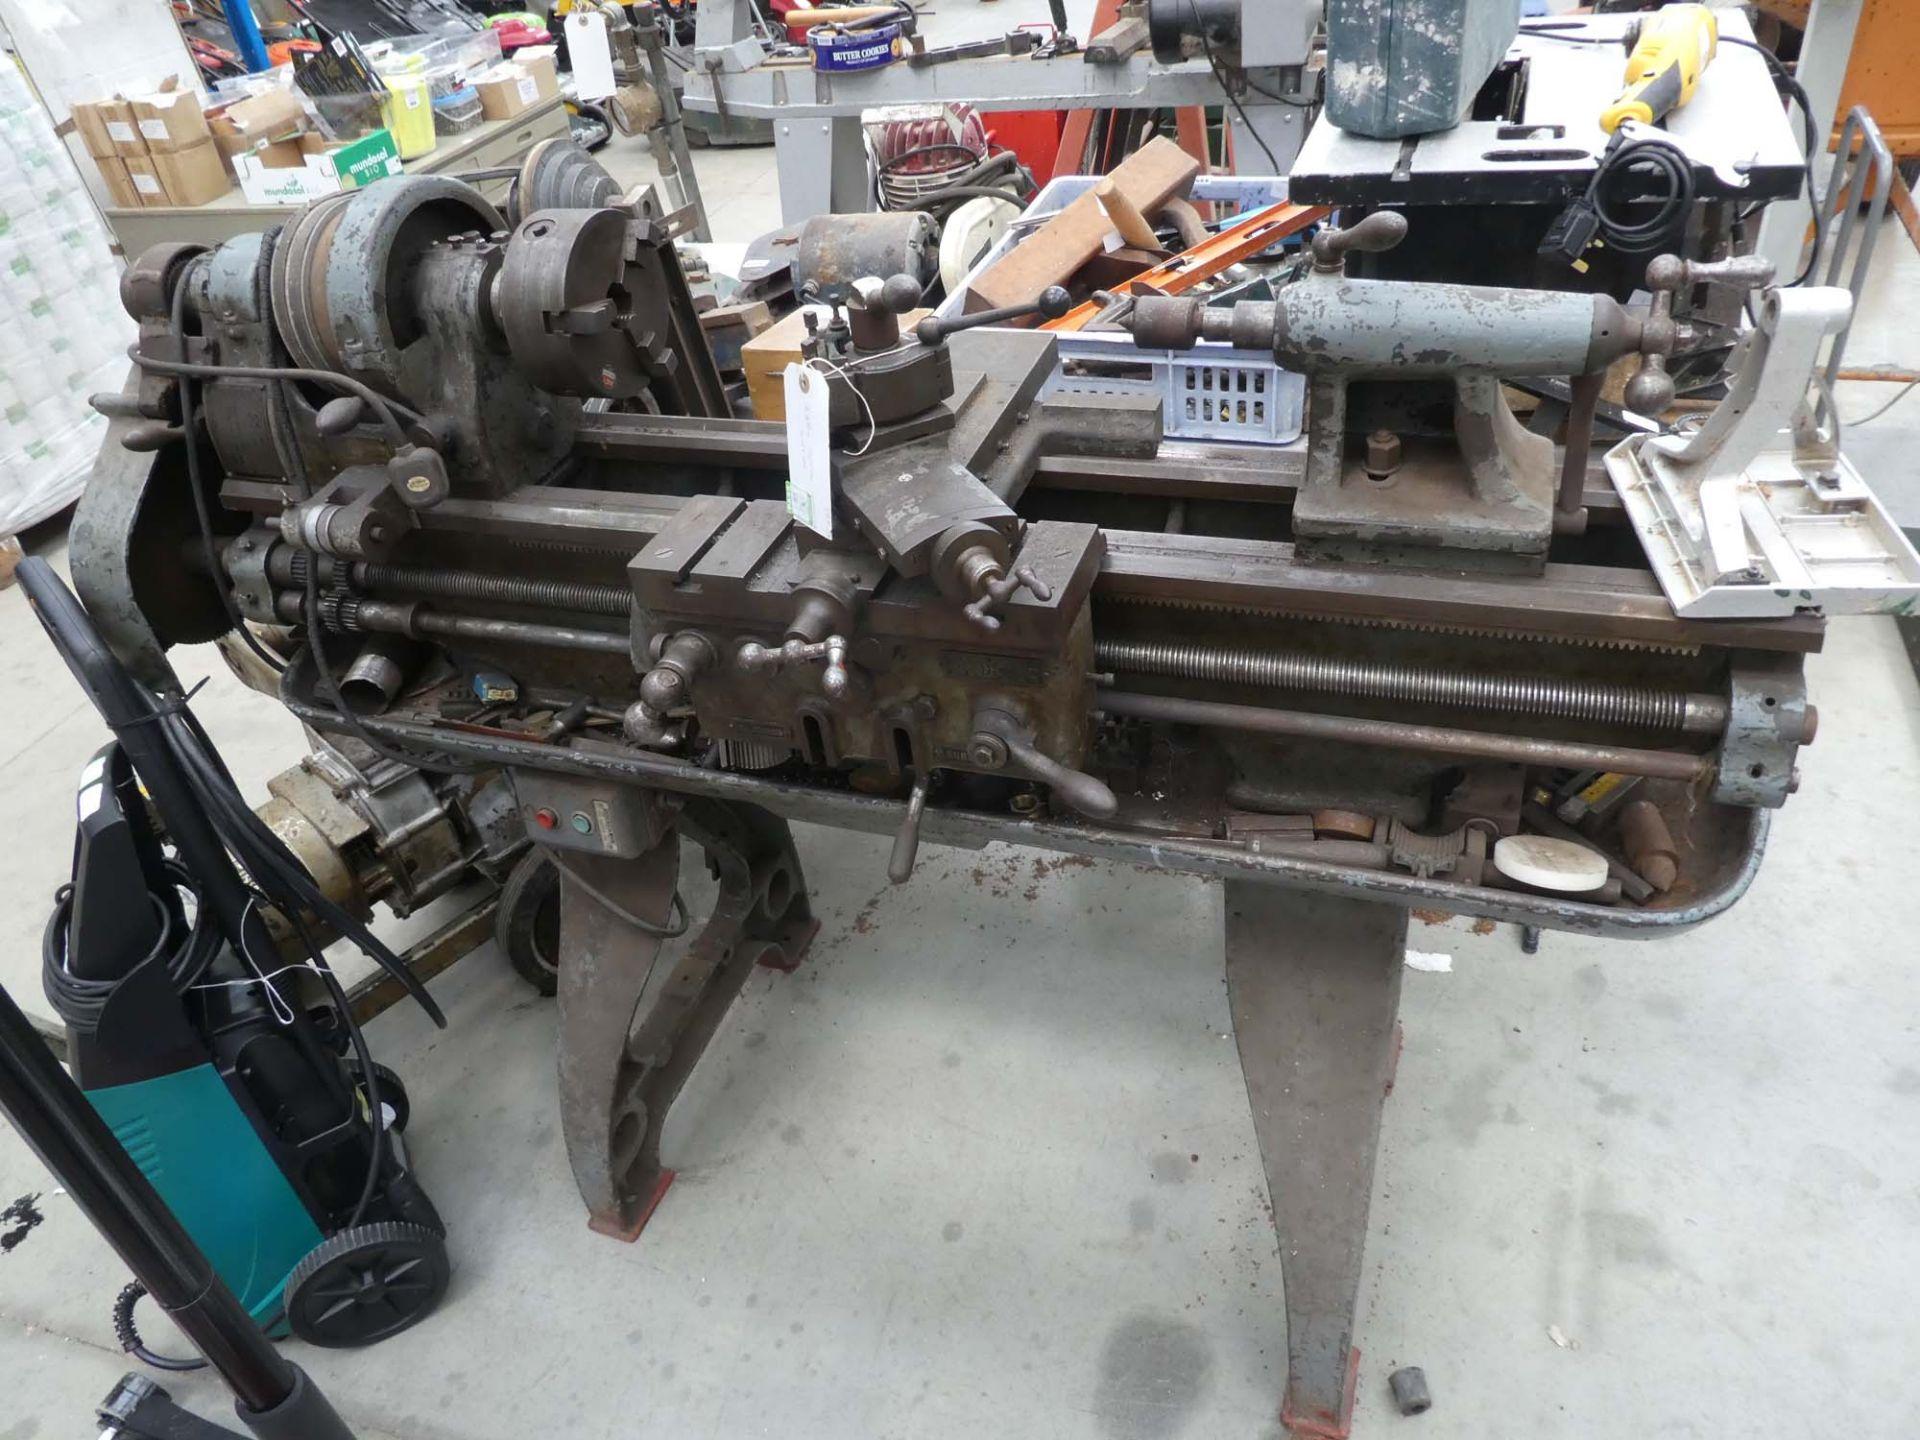 240V metal working lathe